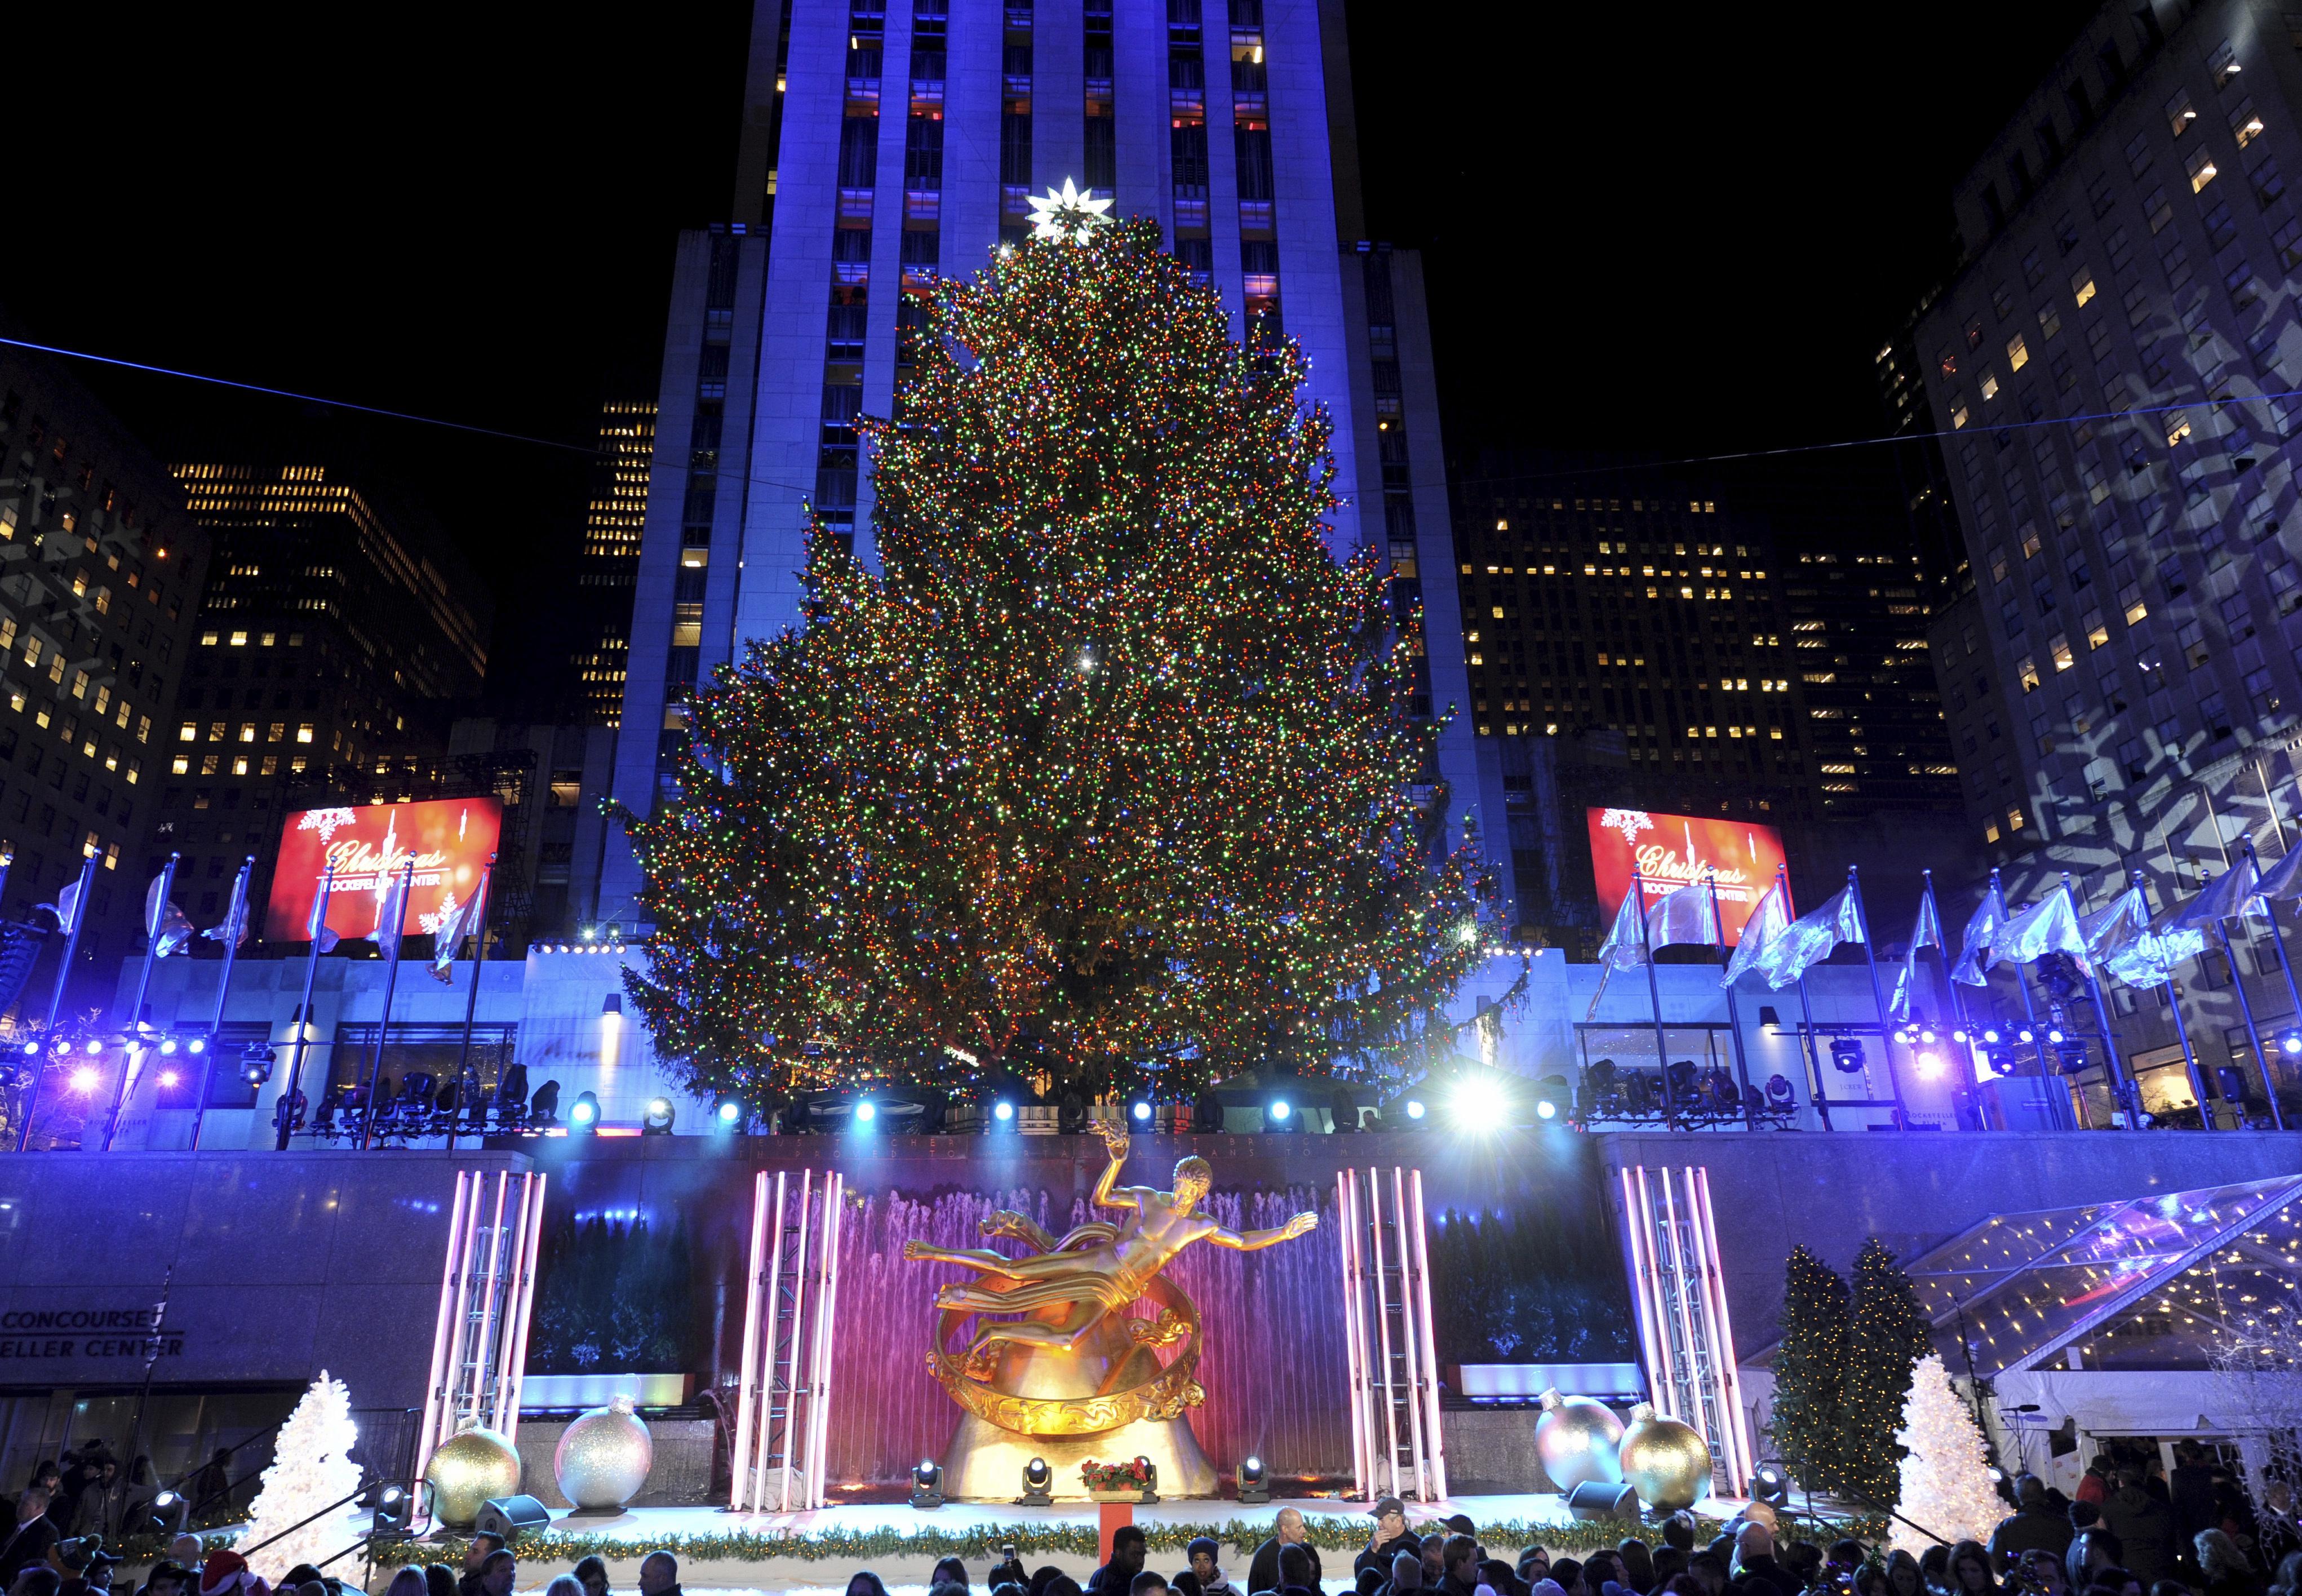 Lighting Of Rockefeller Christmas Tree.2018 Nyc Rockefeller Center Tree Lighting Chilly Evening